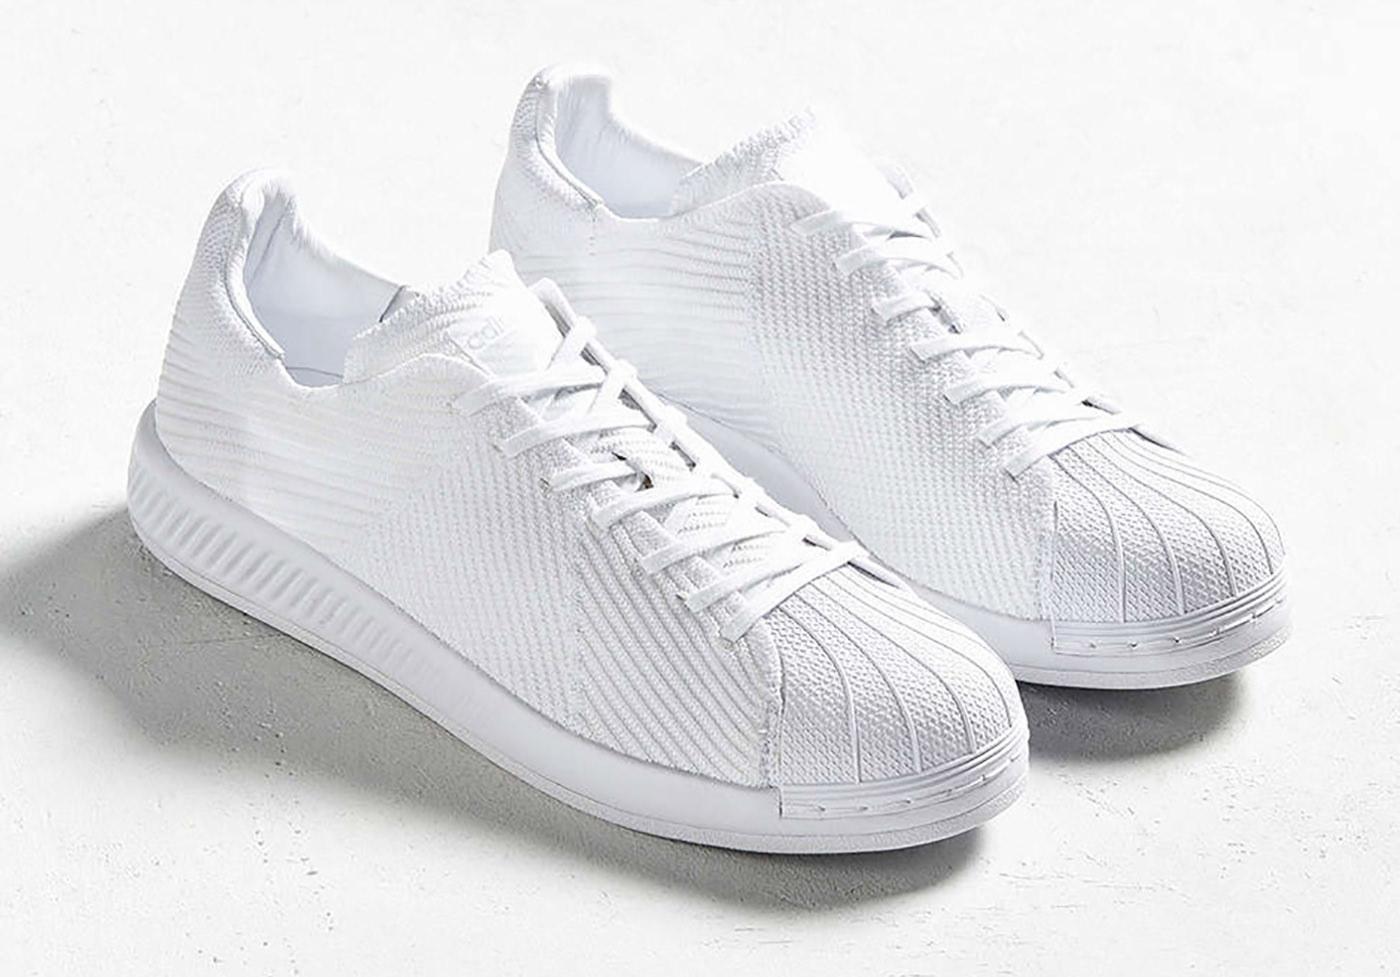 adidas-superstar-primeknit-2